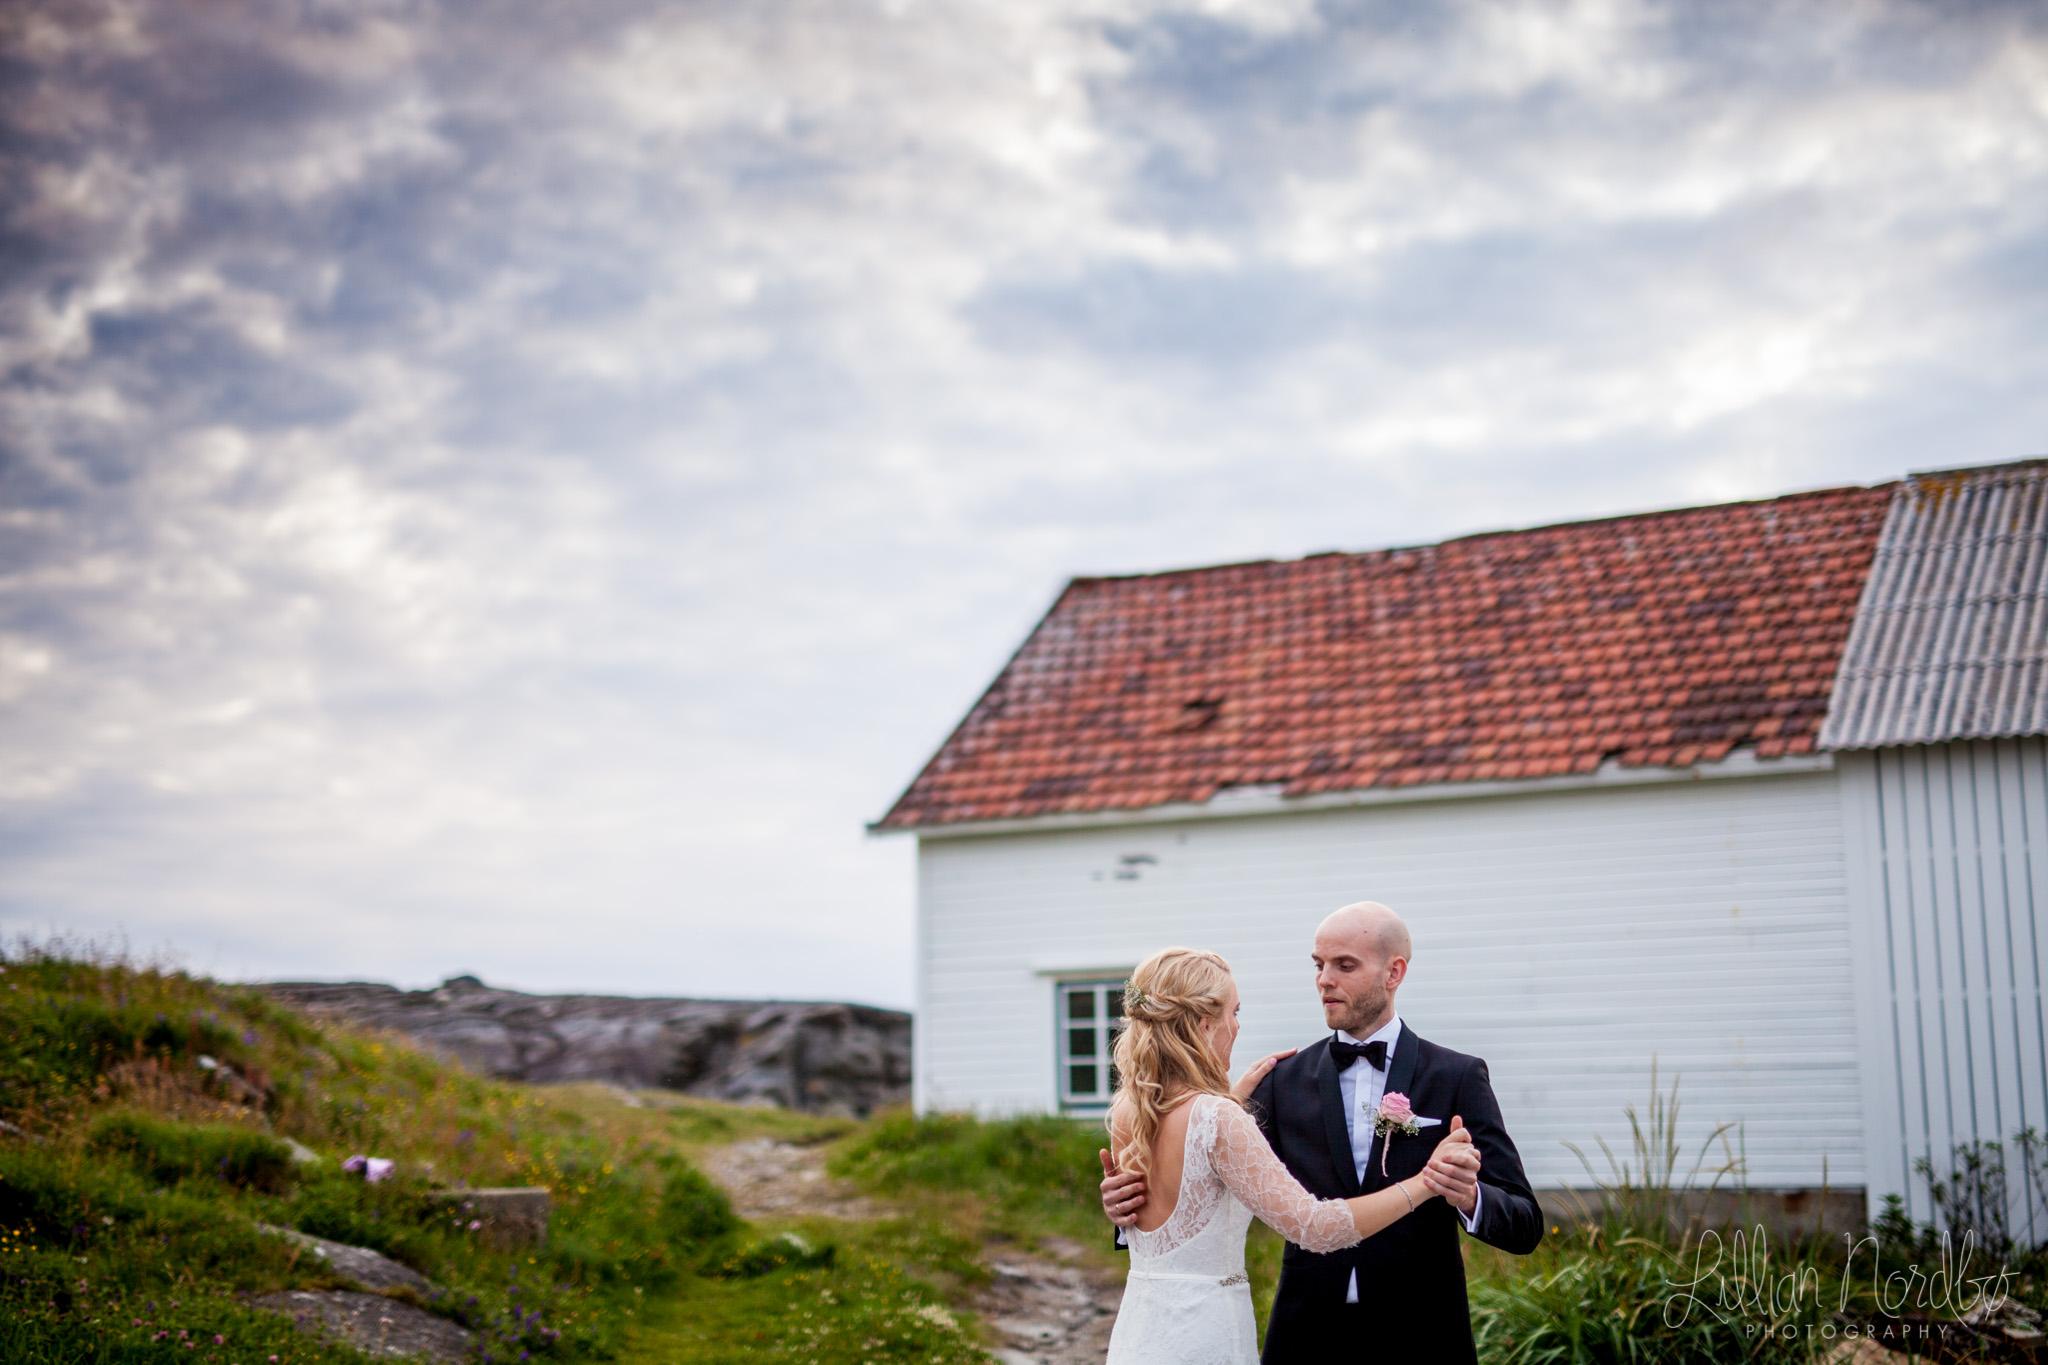 Fotograf Lillian Nordbø - tina+cato-52.jpg